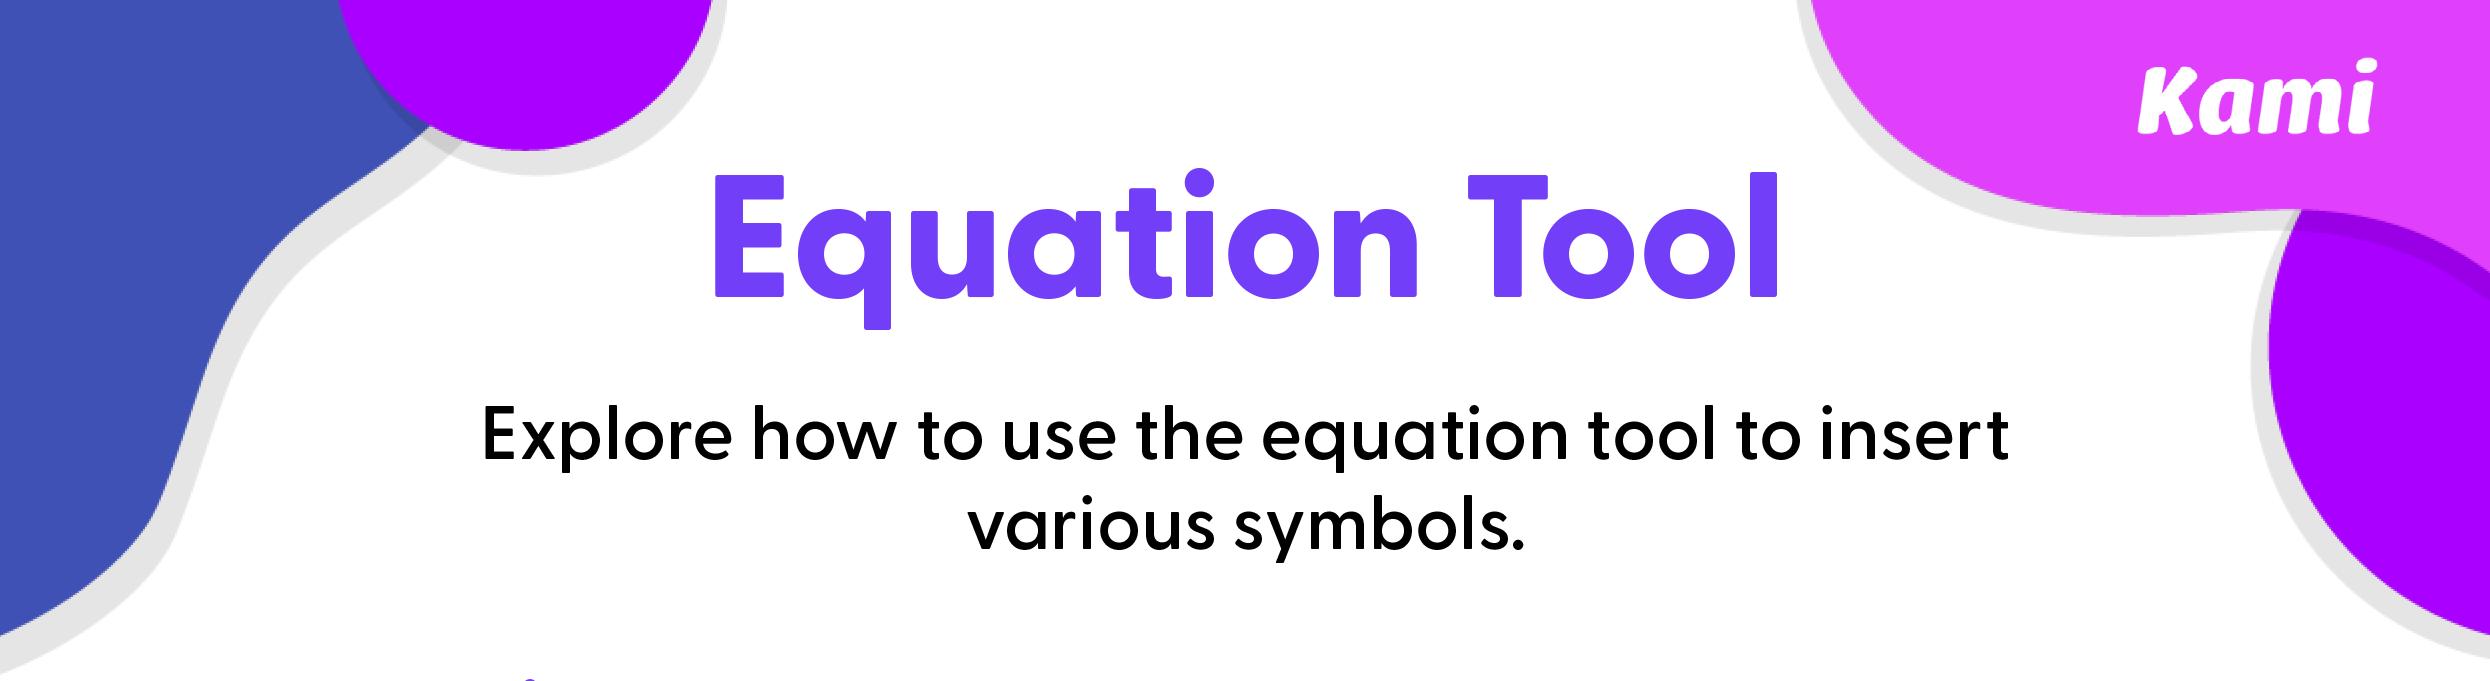 Equation tool preview 1